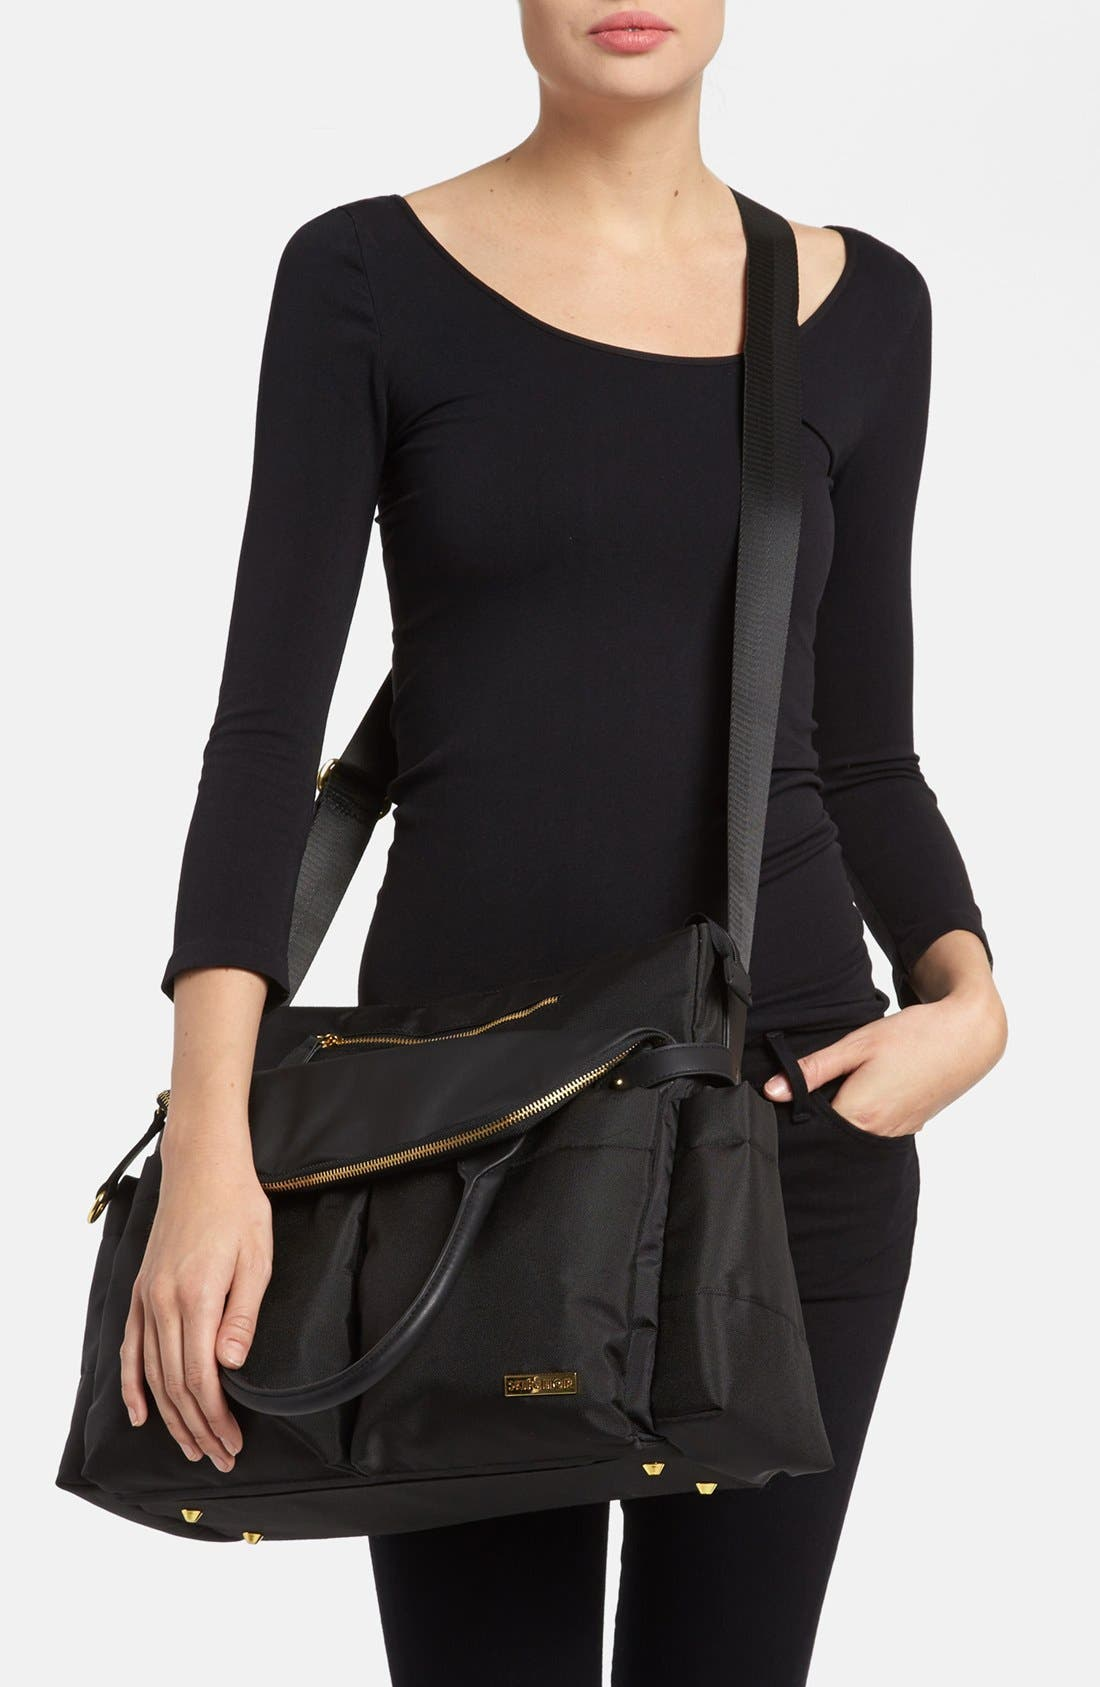 SKIP HOP,                             'Chelsea' Diaper Bag,                             Alternate thumbnail 3, color,                             BLACK